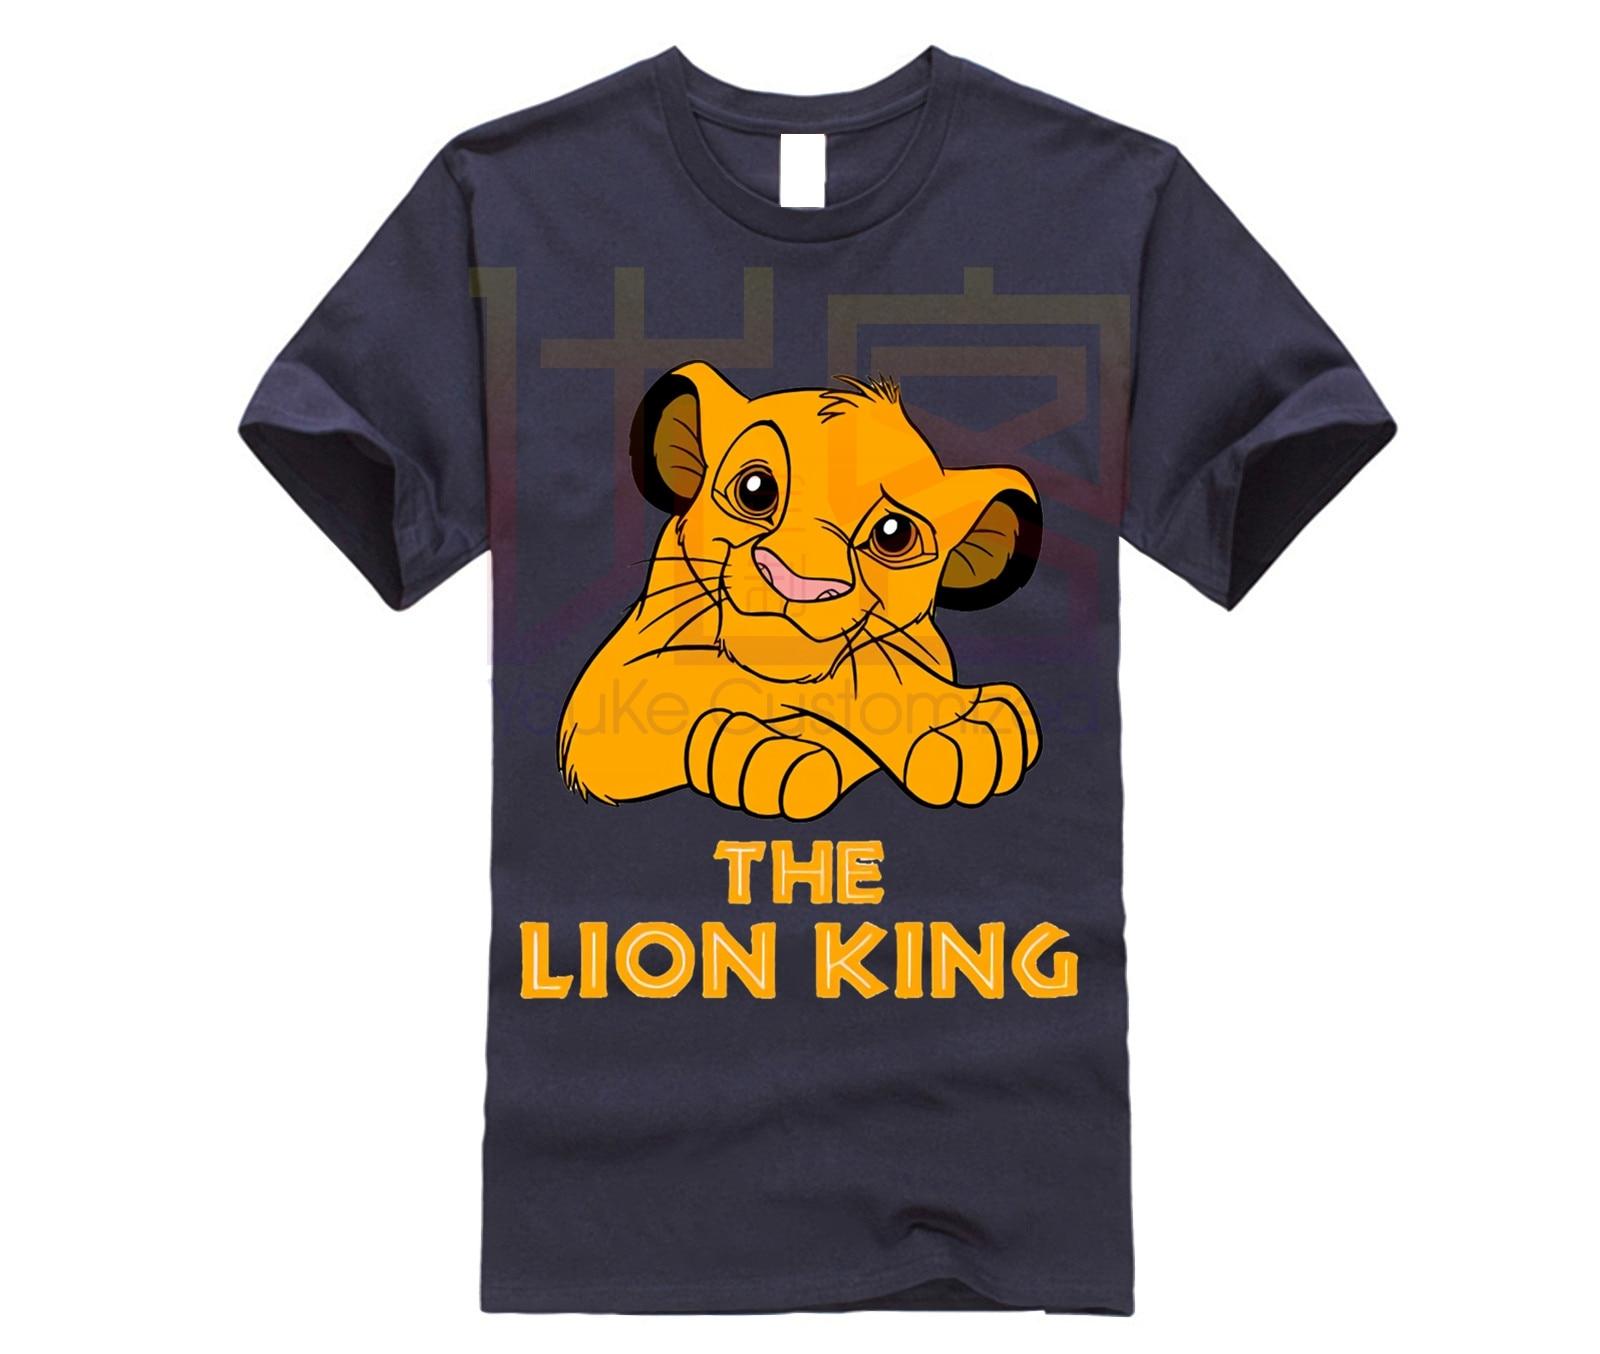 Camiseta para hombre del Rey León, imagen de grupo de dibujos animados gigantes, camiseta de dibujos animados Unisex, nueva camiseta de moda, envío gratis, divertido